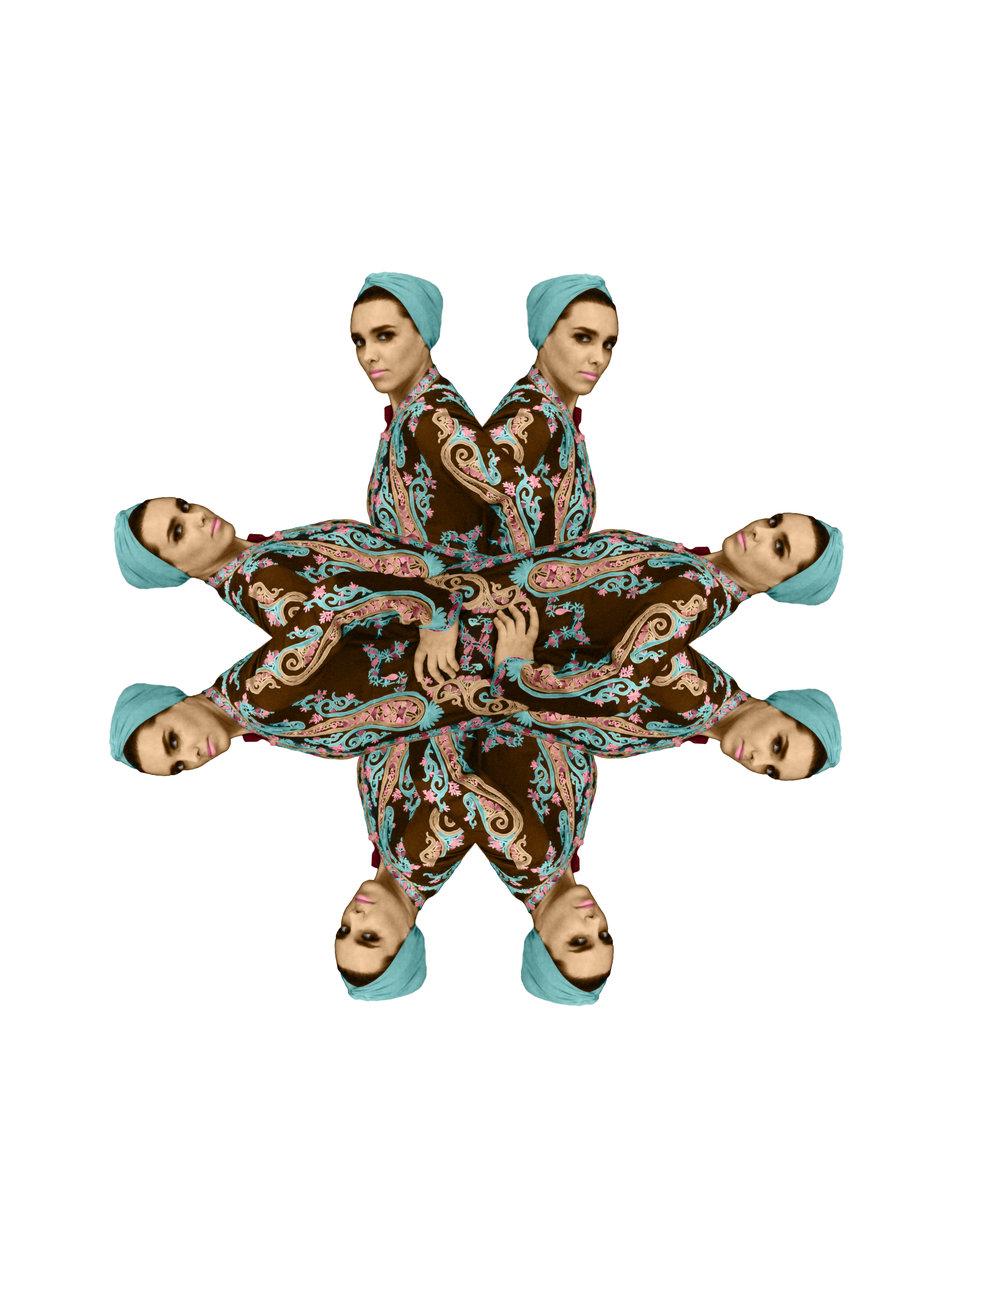 Badawyah fy Parees (A Bedouin in Paris) _1_2011_Digitalprint on Vinyl_200cmx200cm.jpg